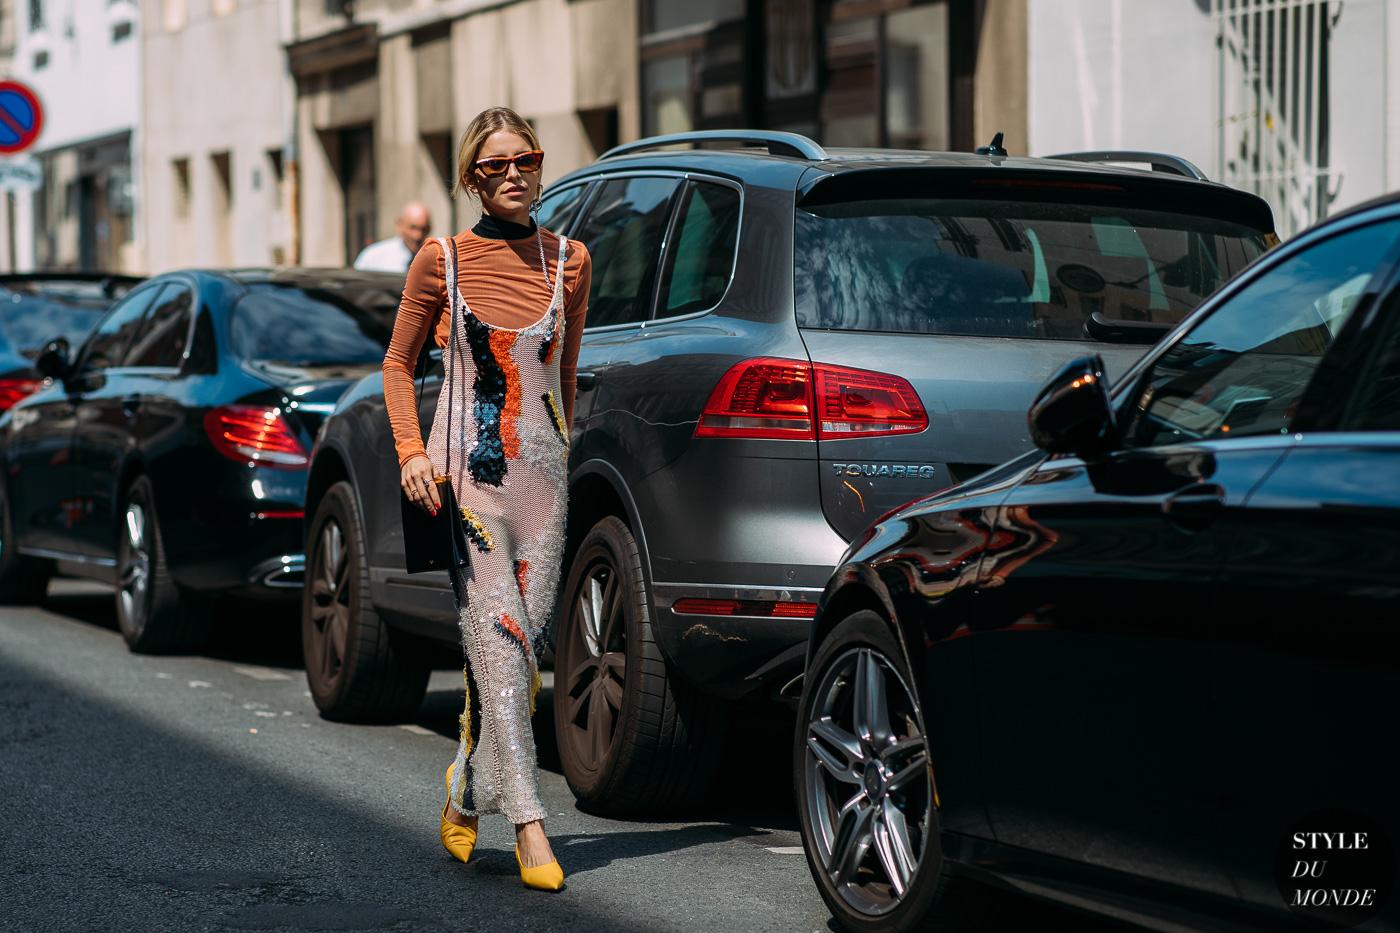 Caroline Daur by STYLEDUMONDE Street Style Fashion Photography20180701_48A3510